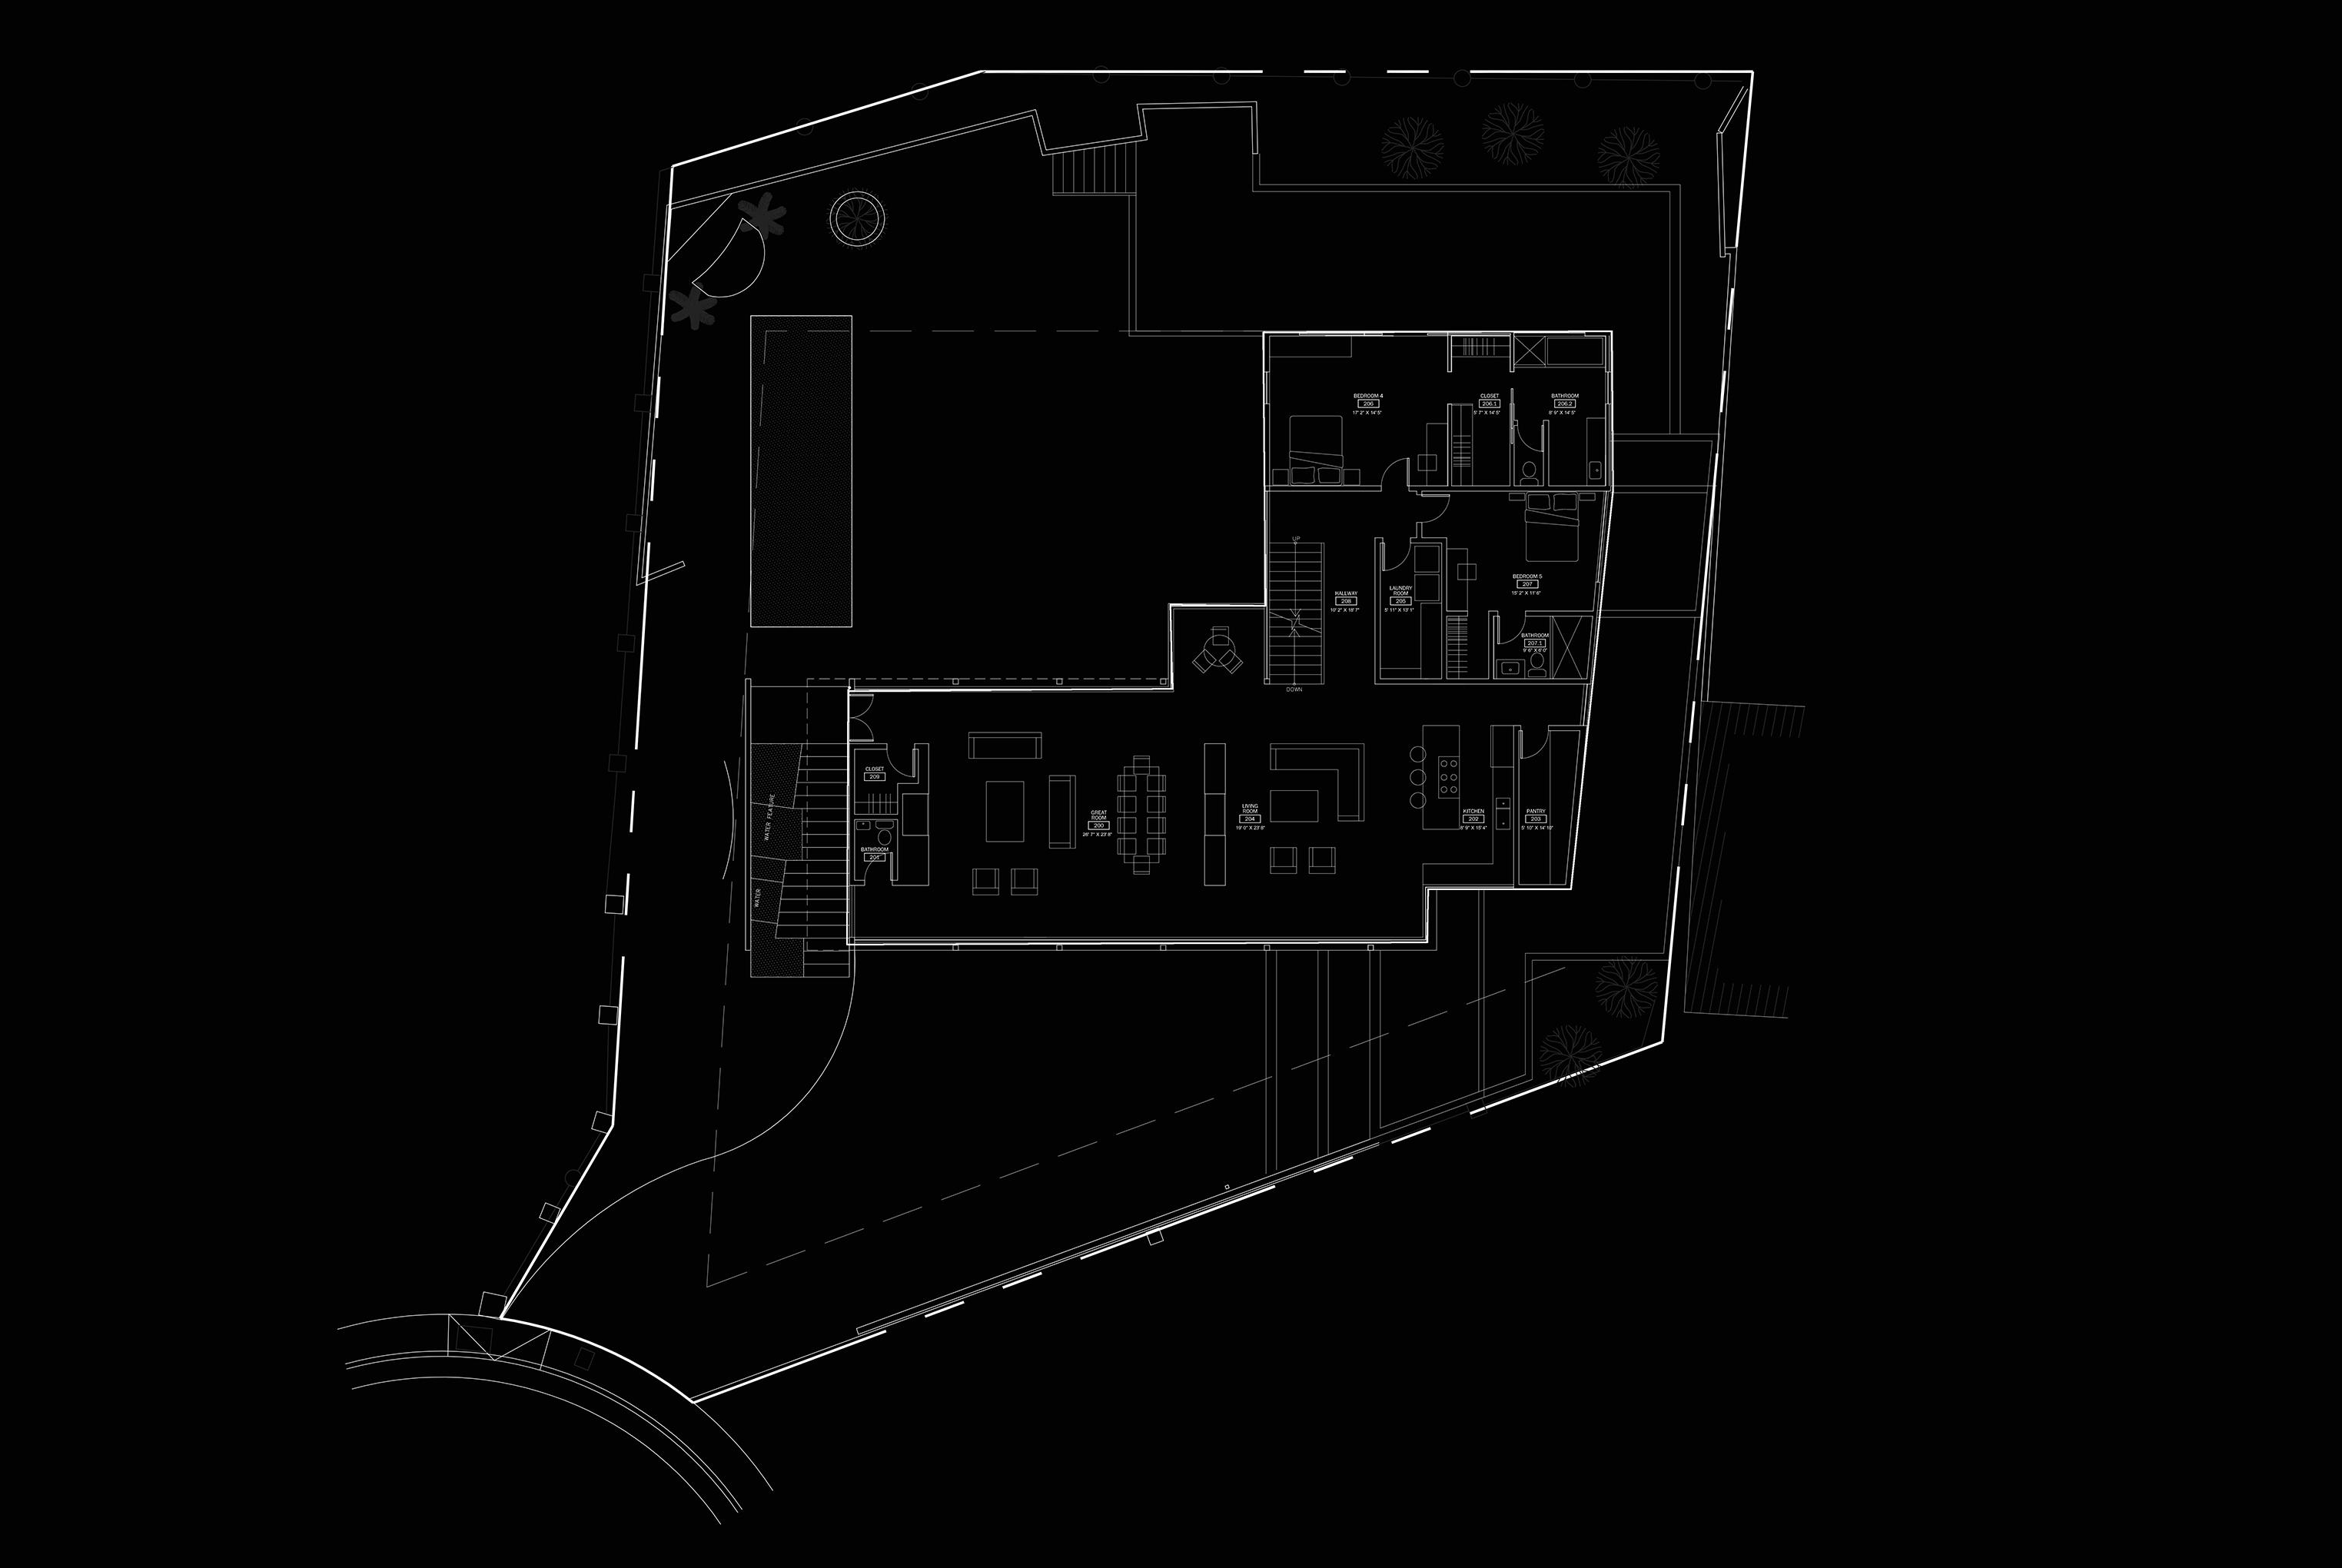 poirierdesign-site-plan.jpg